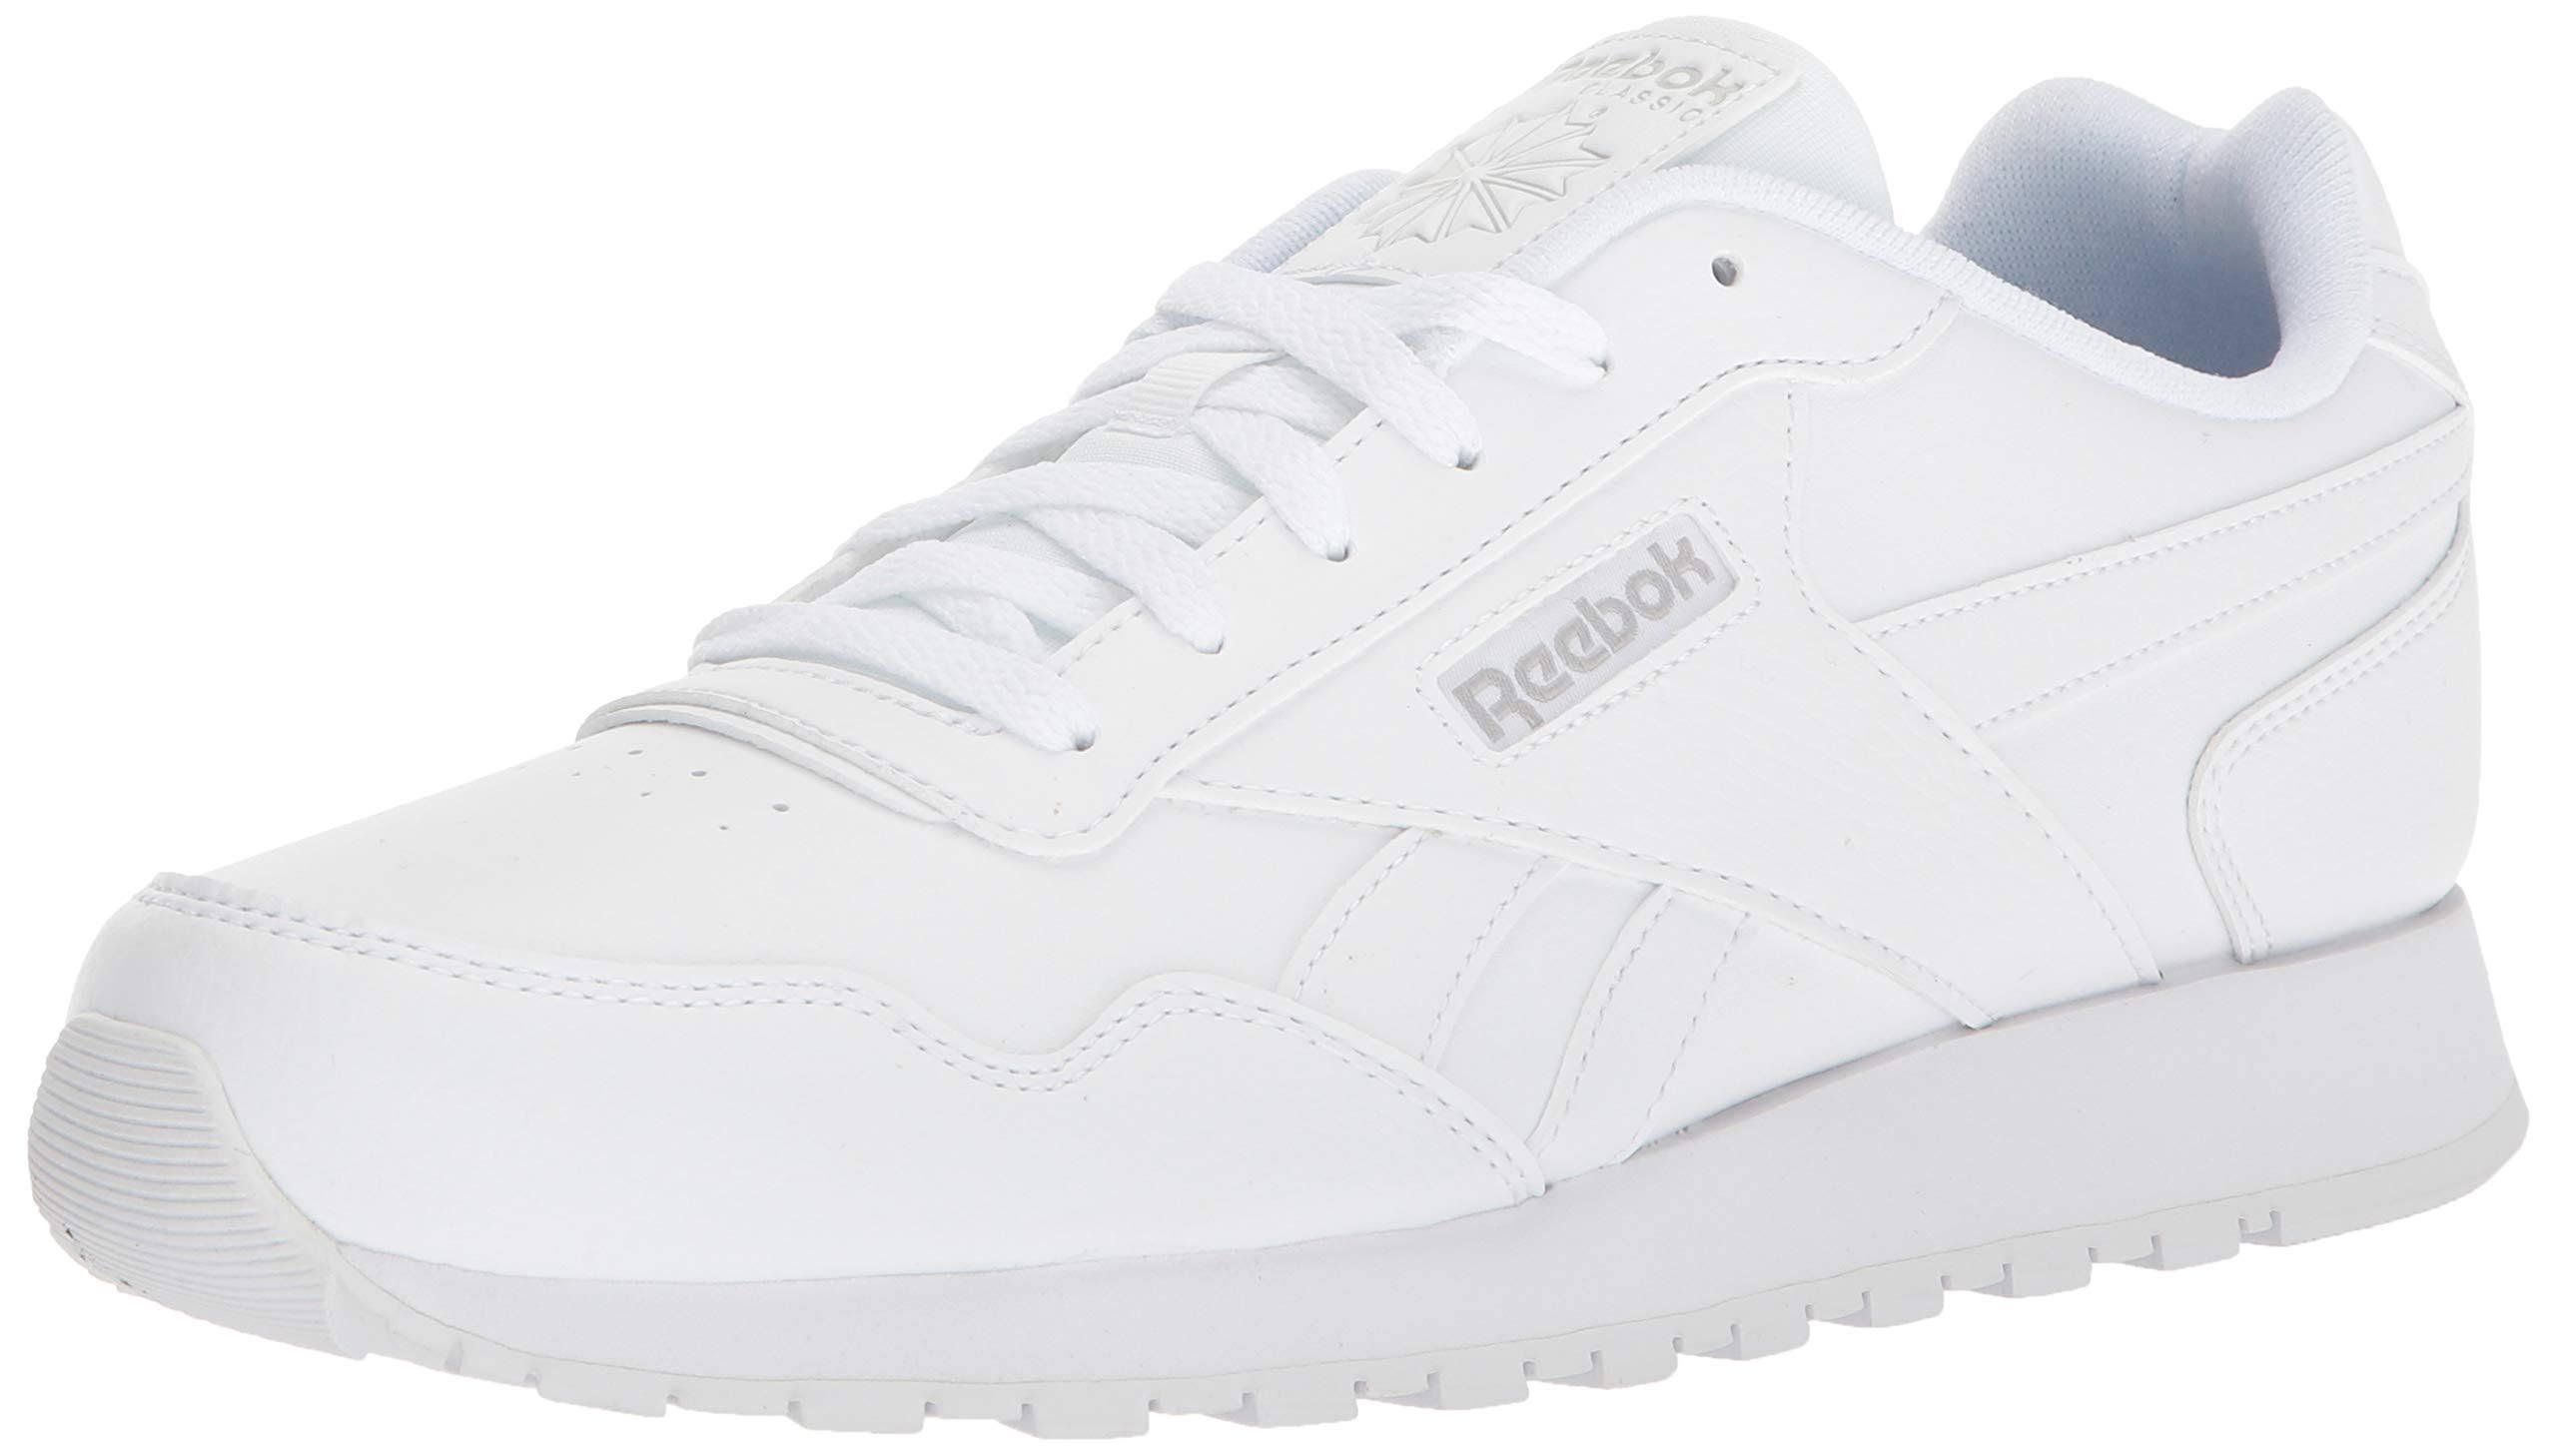 Harman Classic Blanco Para Calzado Reebok Acero Run 6 Mujer Blanco 5EzvTvqwx